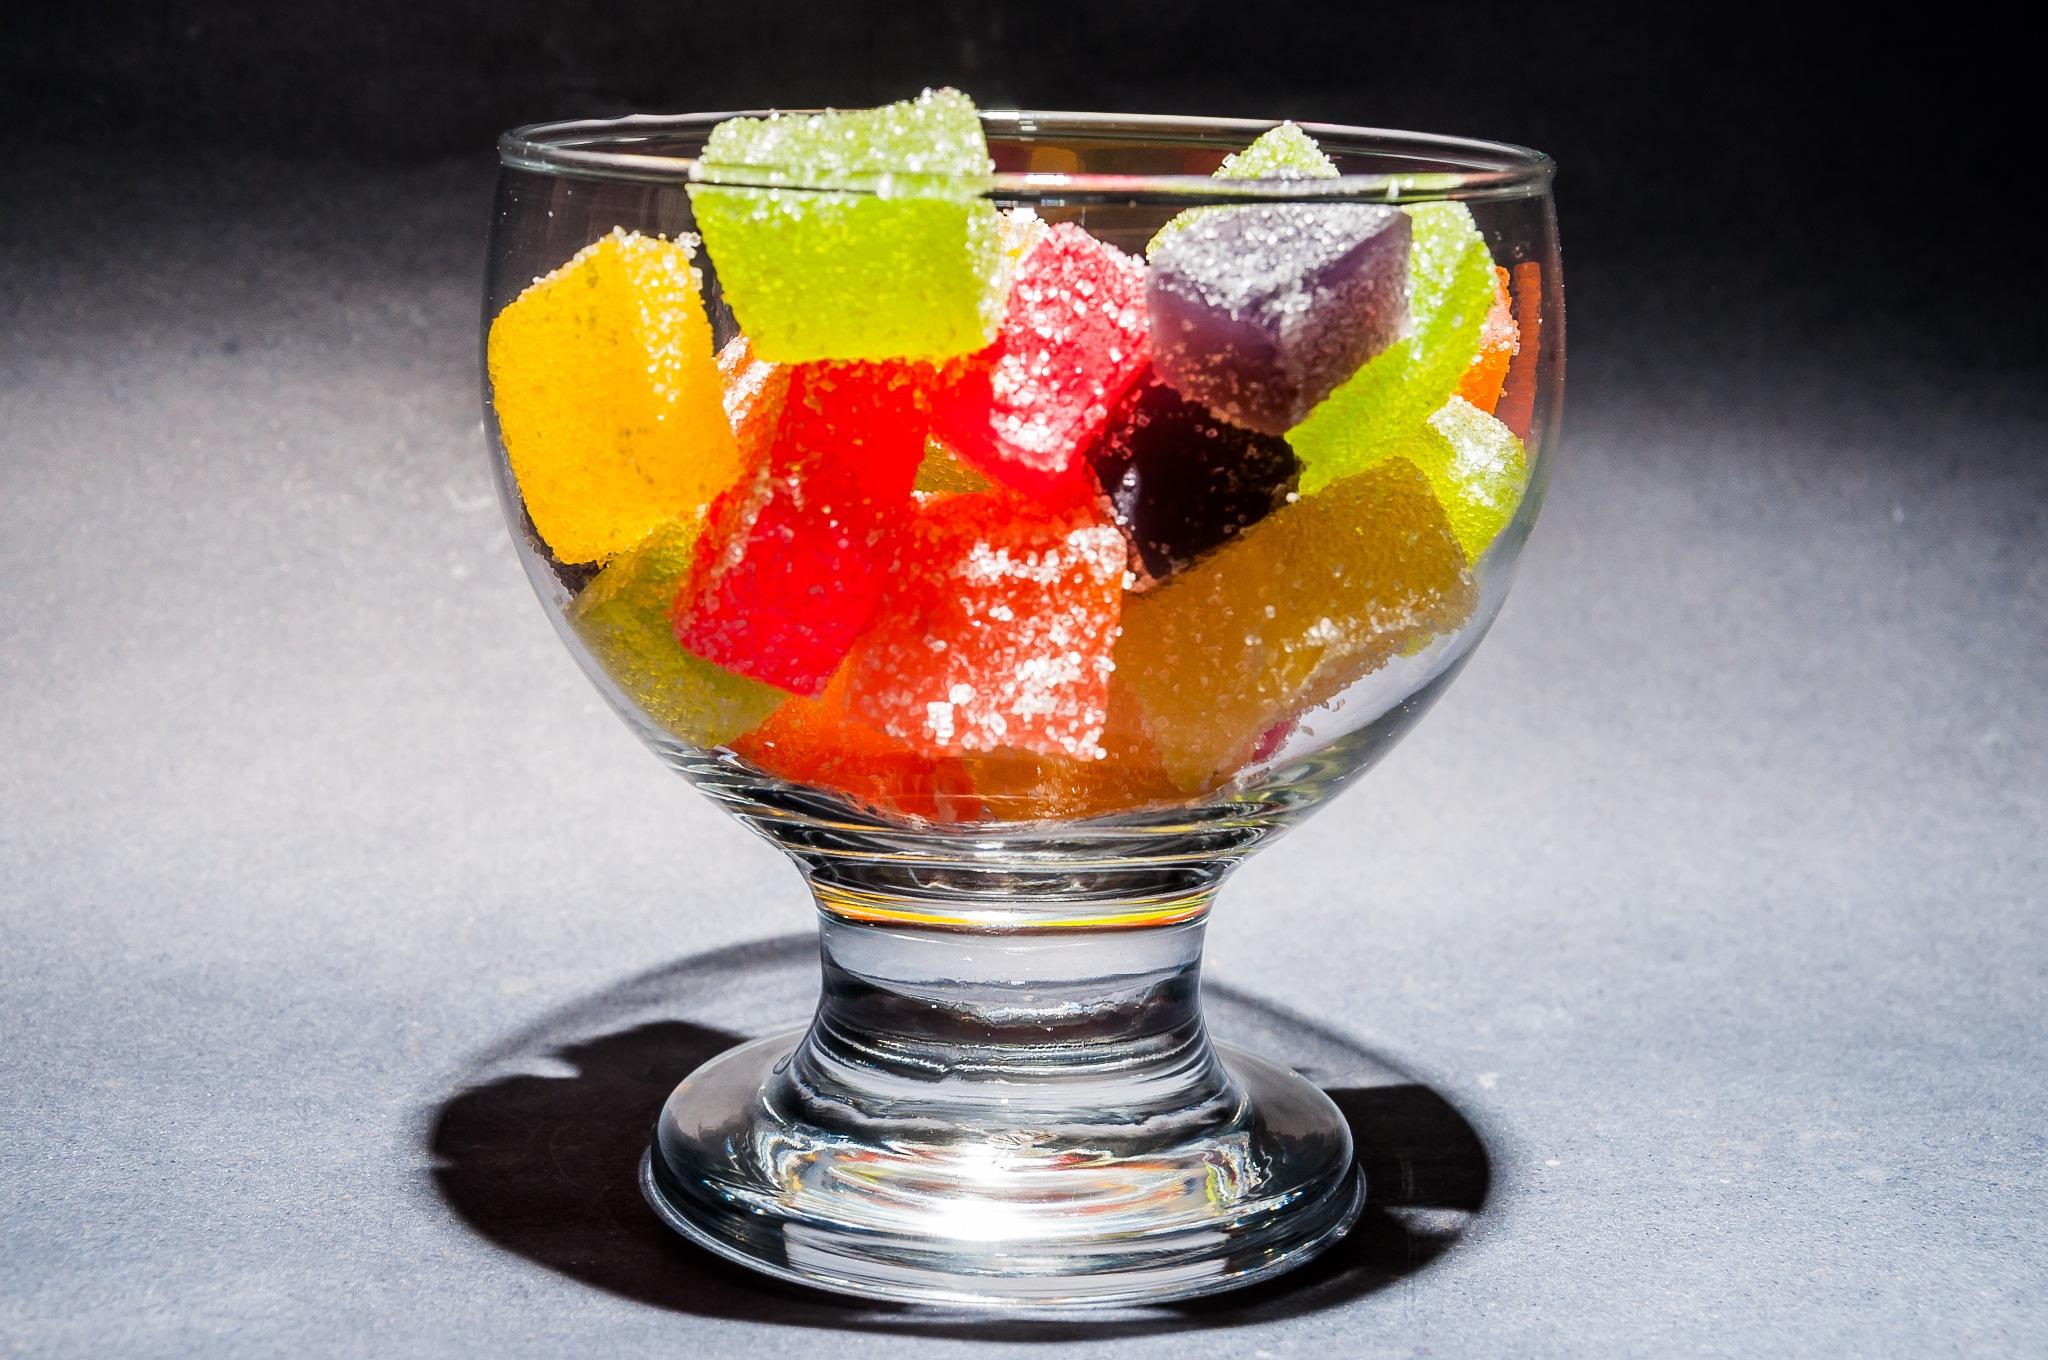 Candy by Valmirez